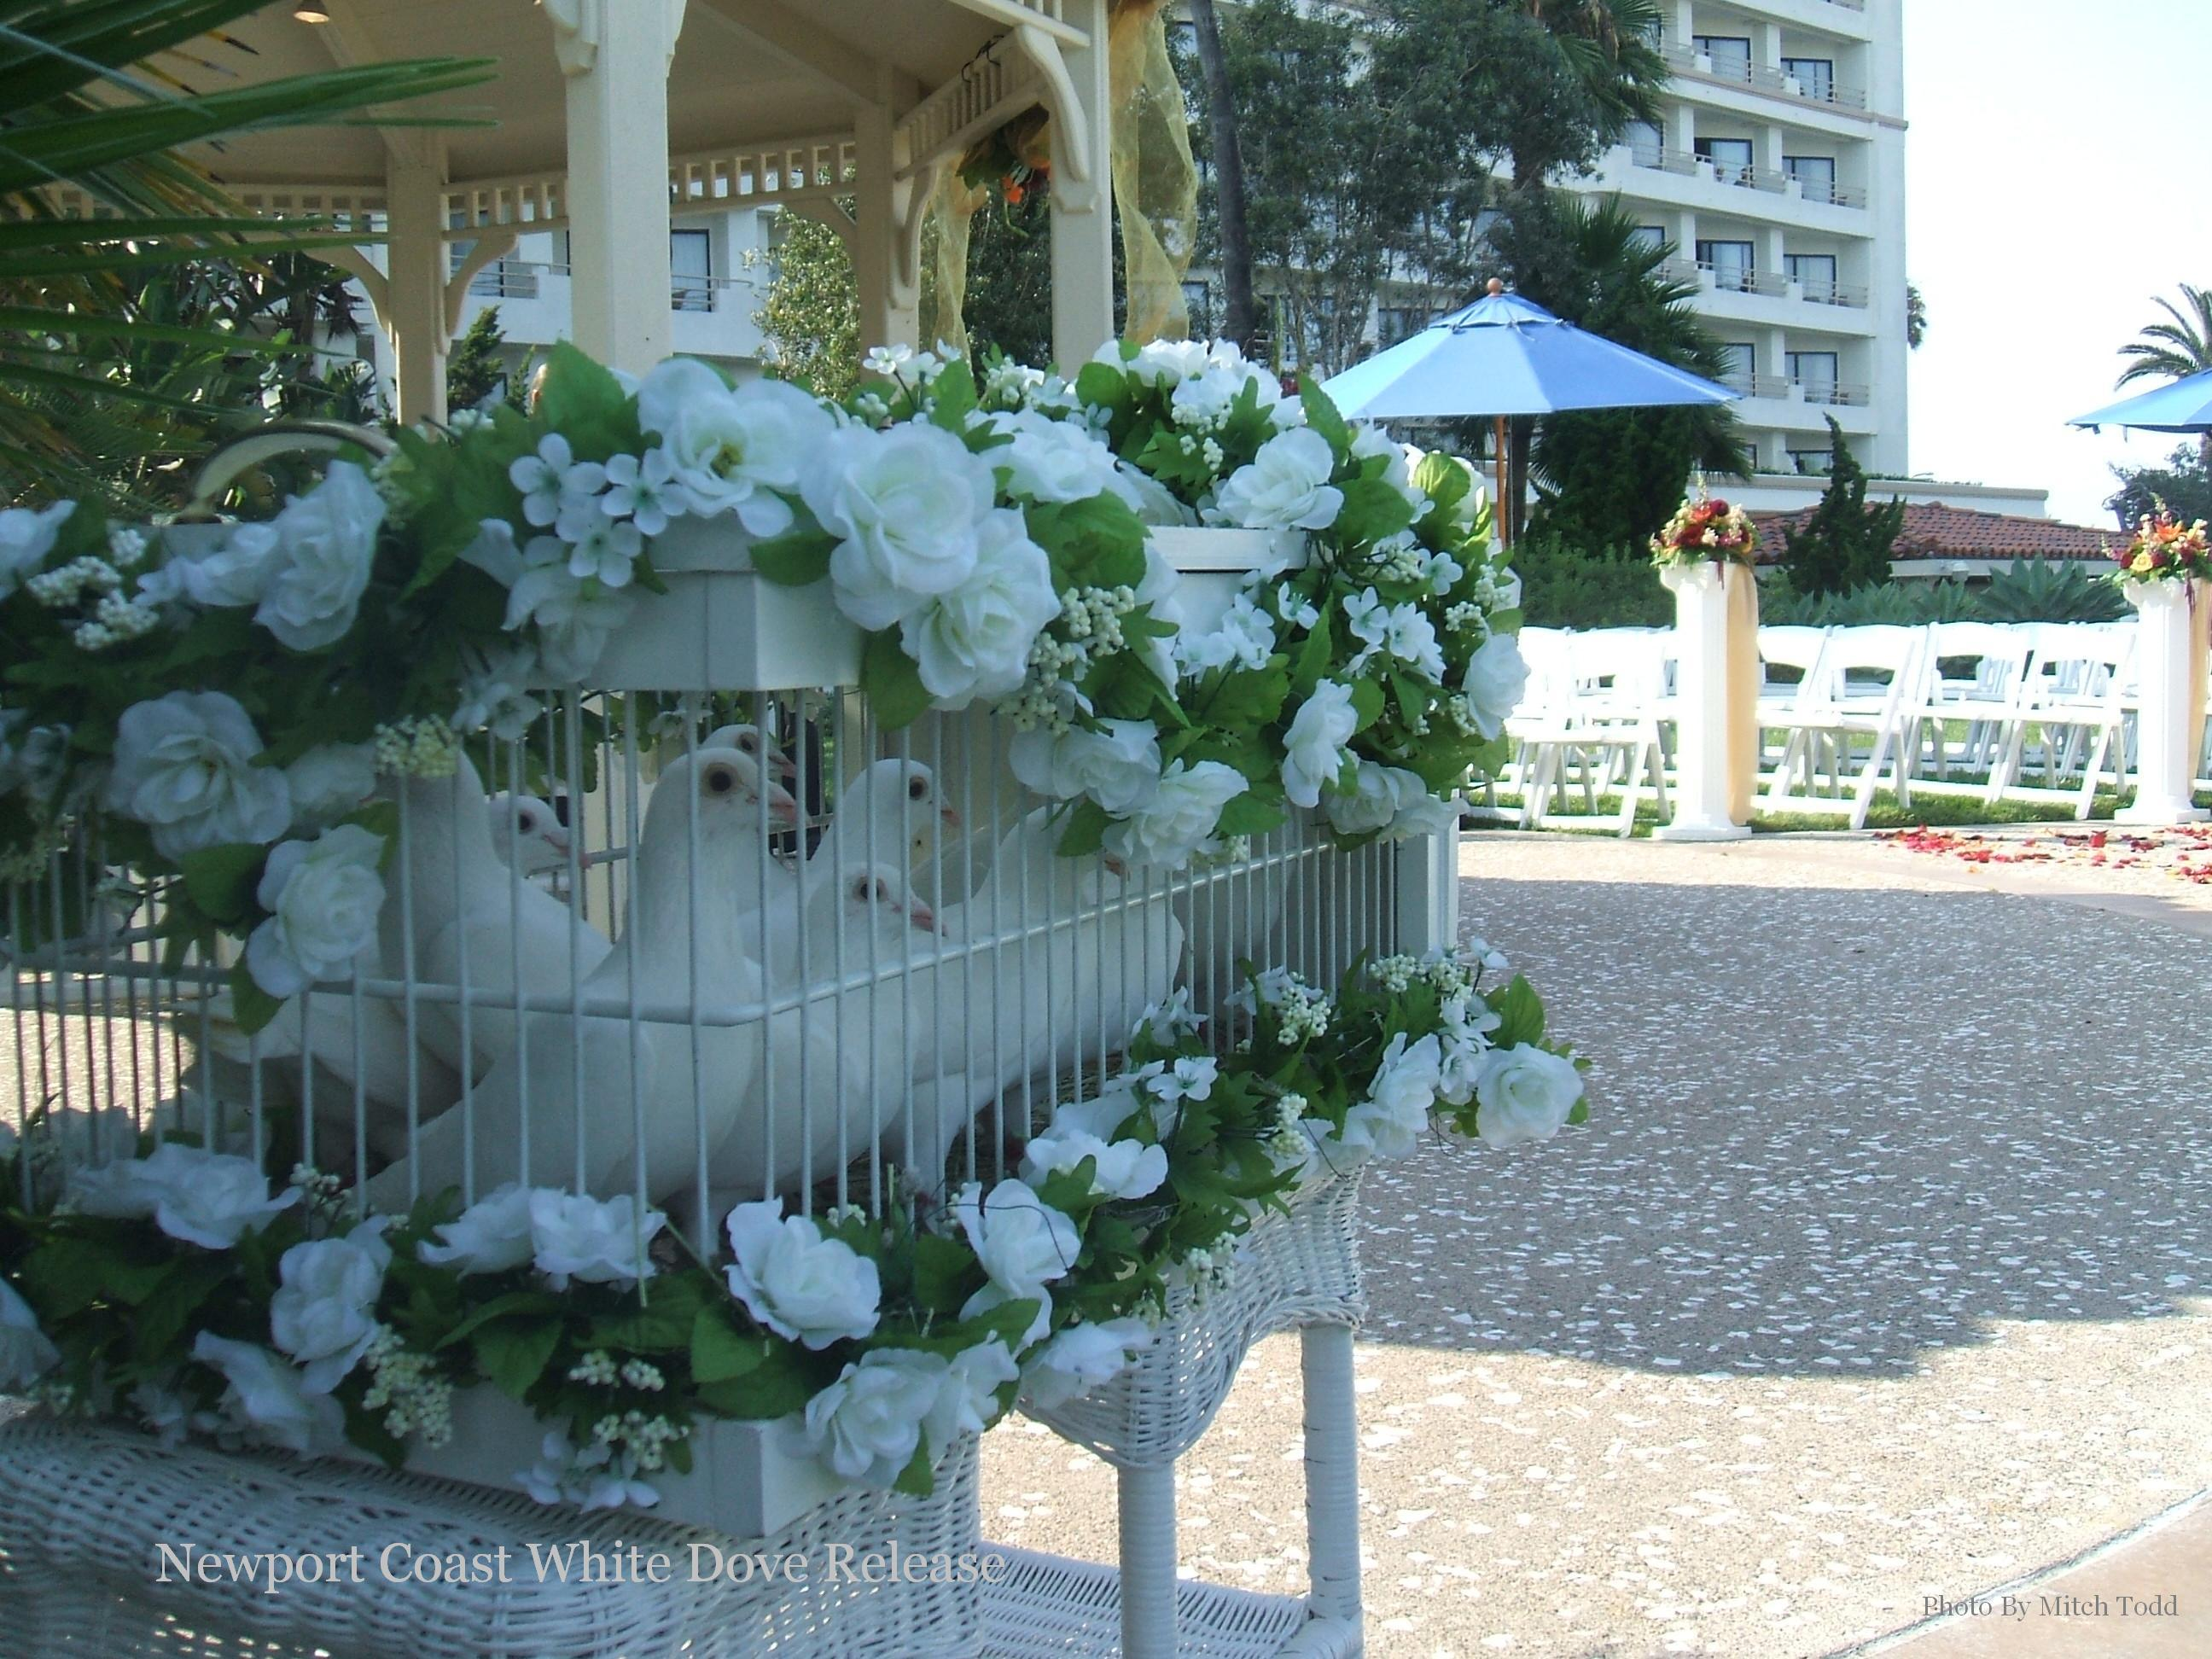 white, Hilton, Doves, Hb